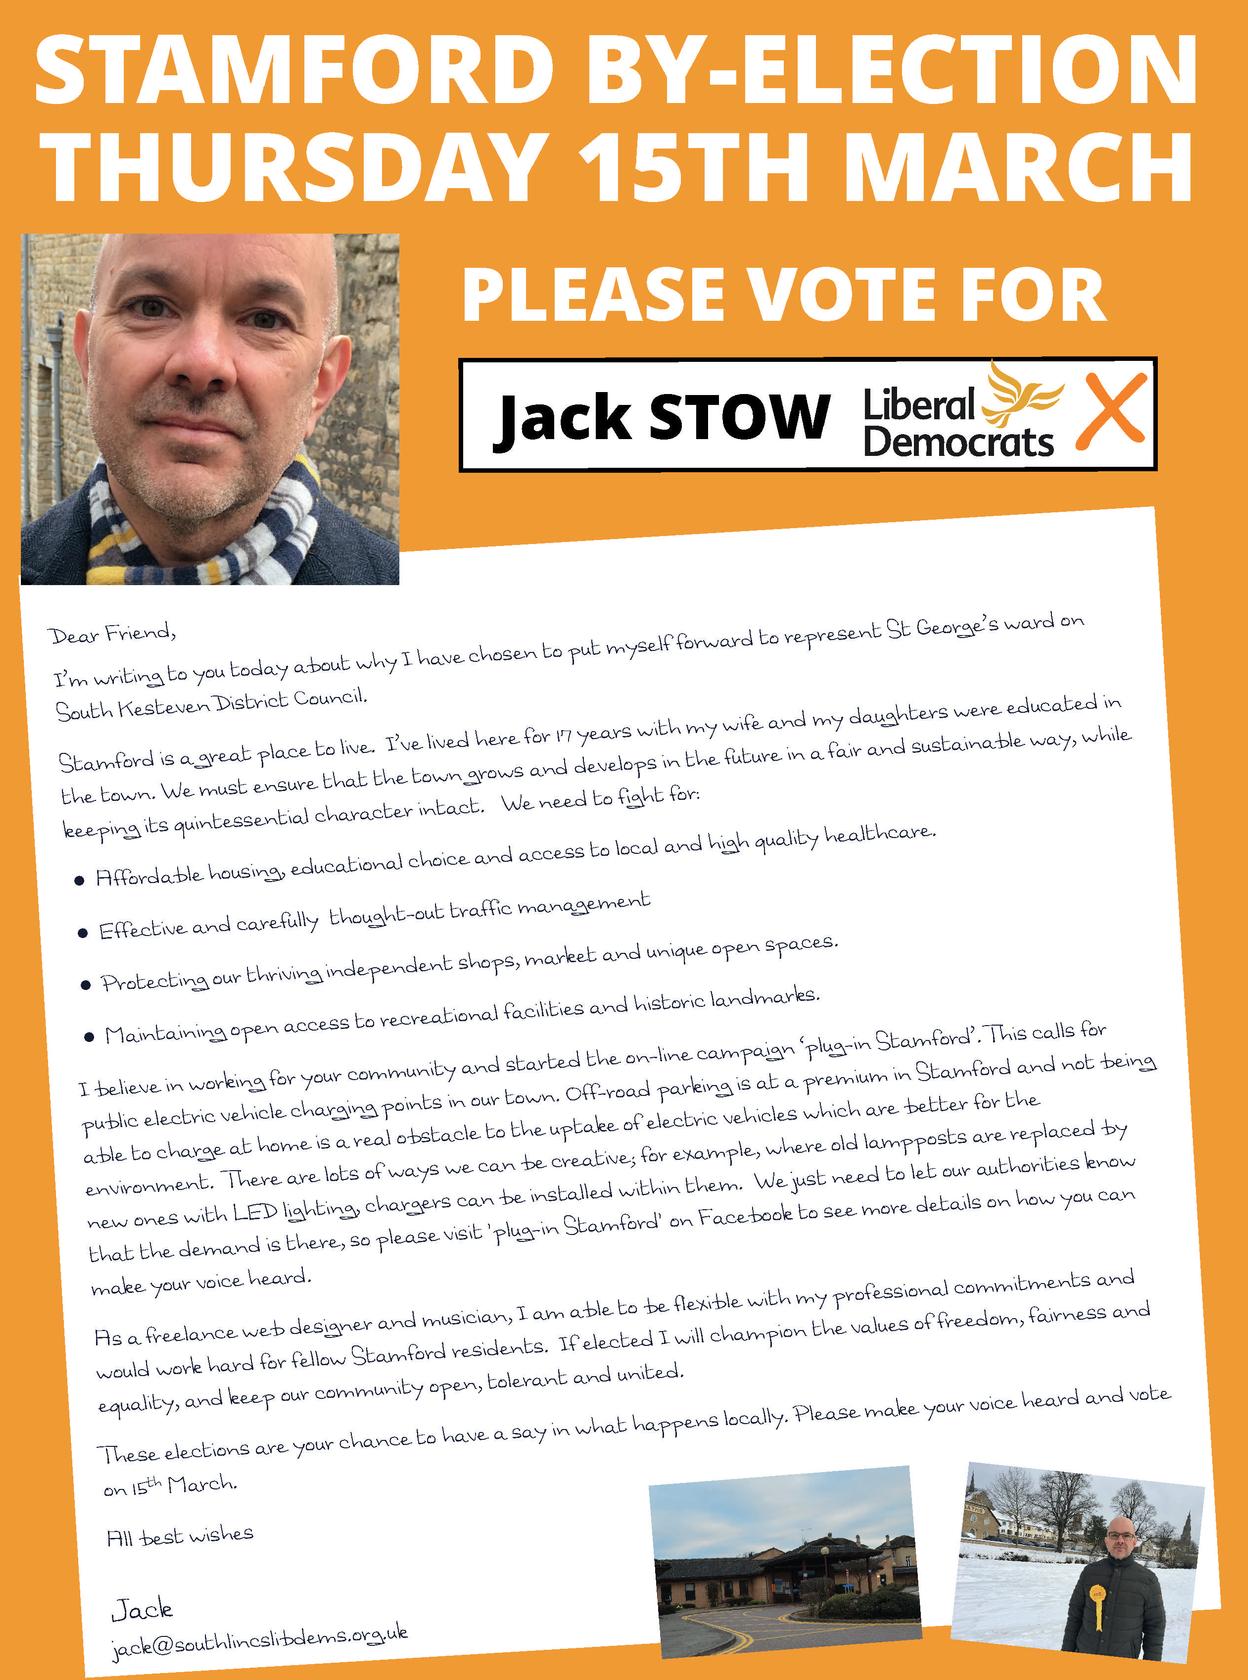 Jack Stow focus